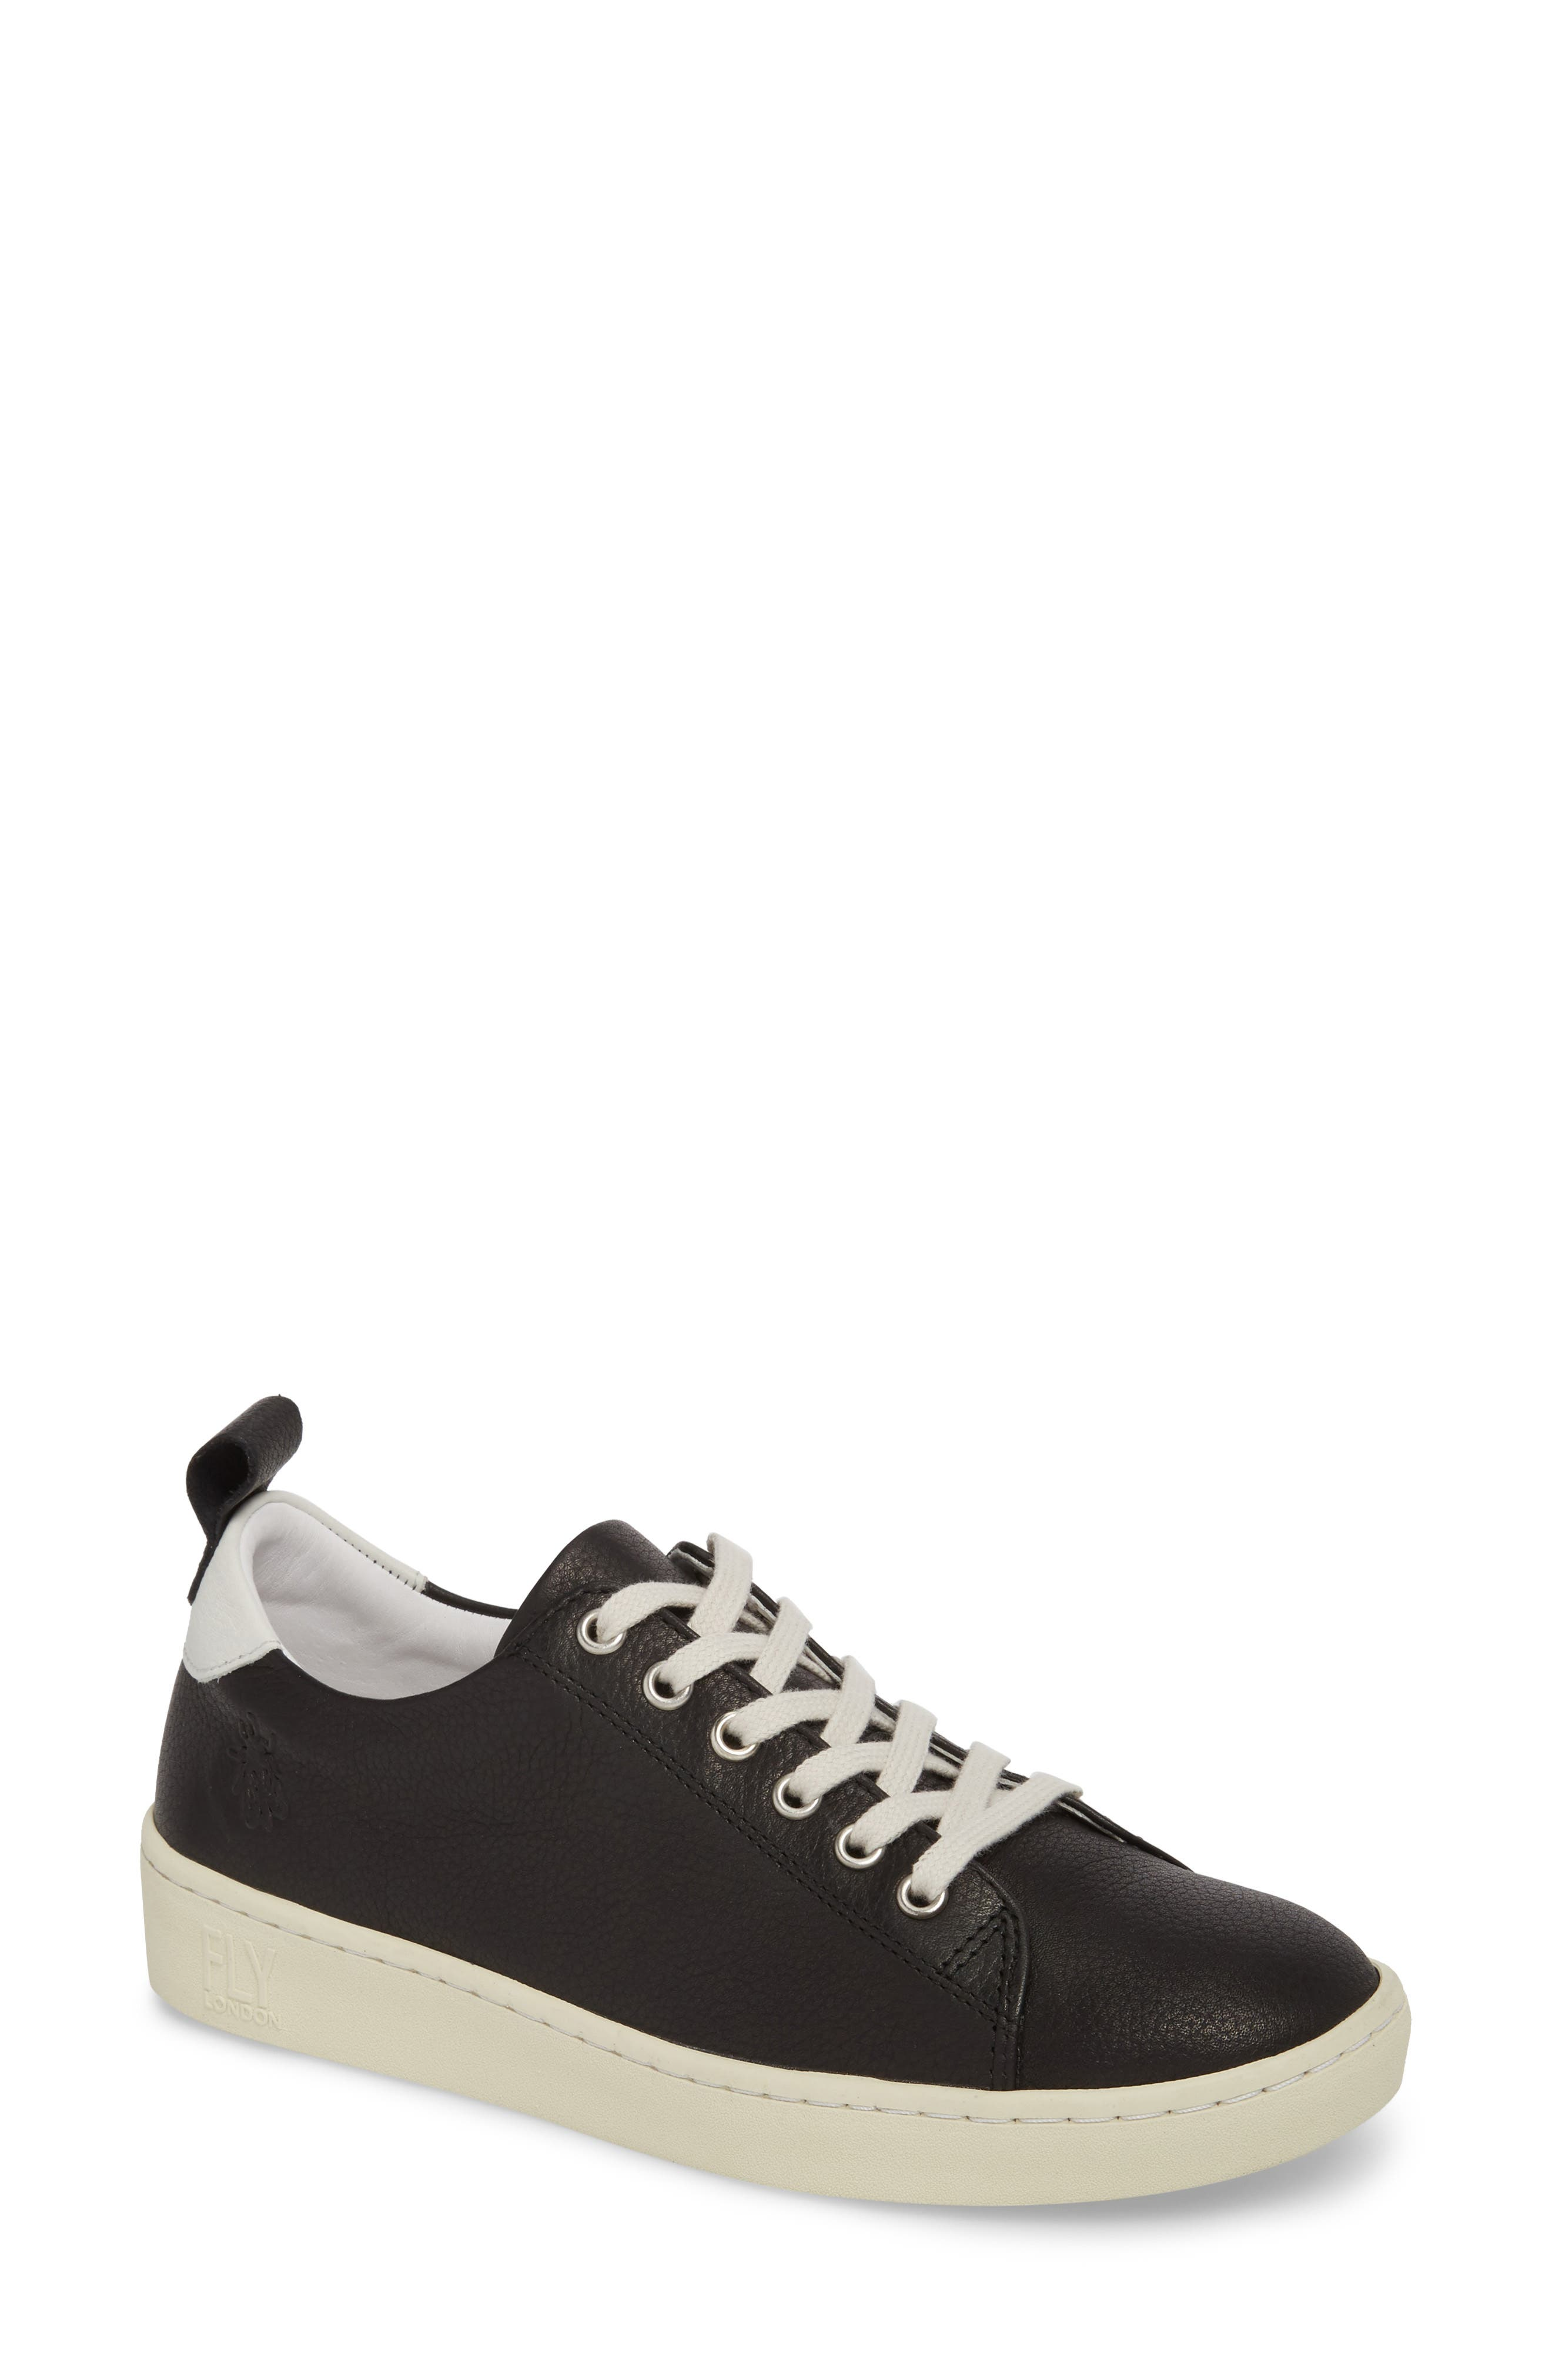 Maku Lace-Up Sneaker,                             Main thumbnail 1, color,                             BLACK BRITO LEATHER